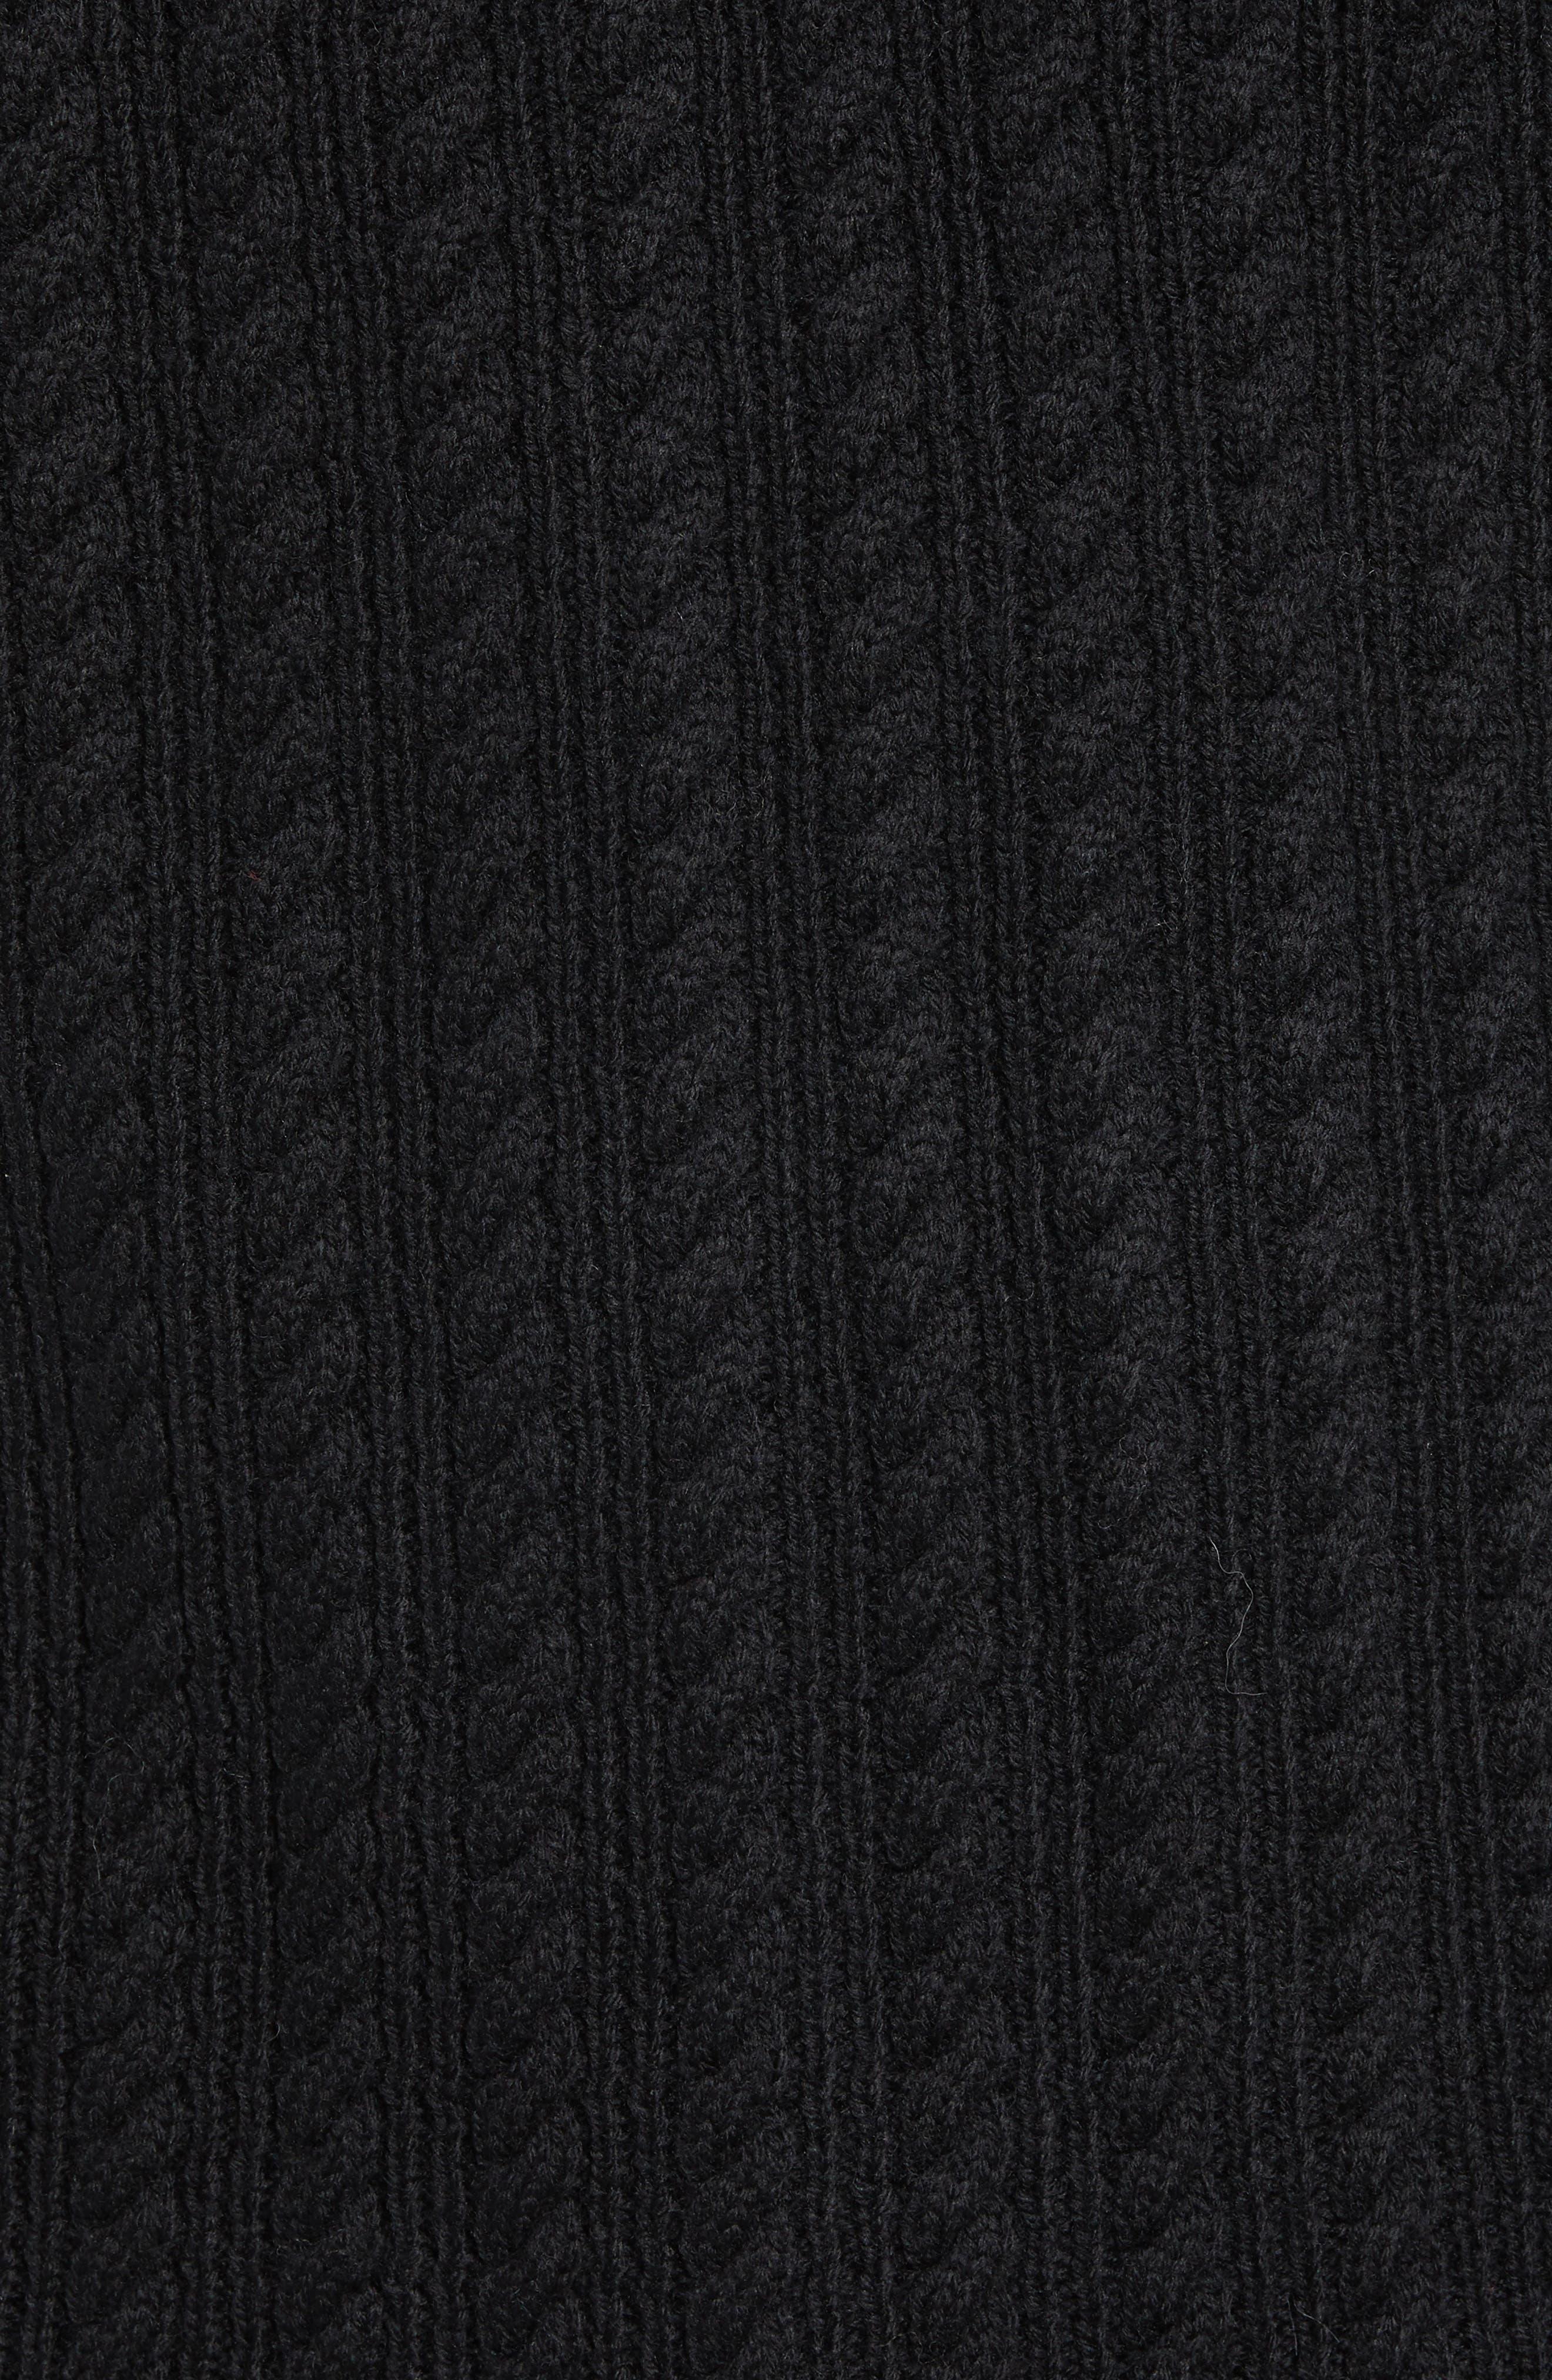 Block Merino Wool Cable Knit Sweater,                             Alternate thumbnail 5, color,                             BLACK CAVIAR COLORBLOCK